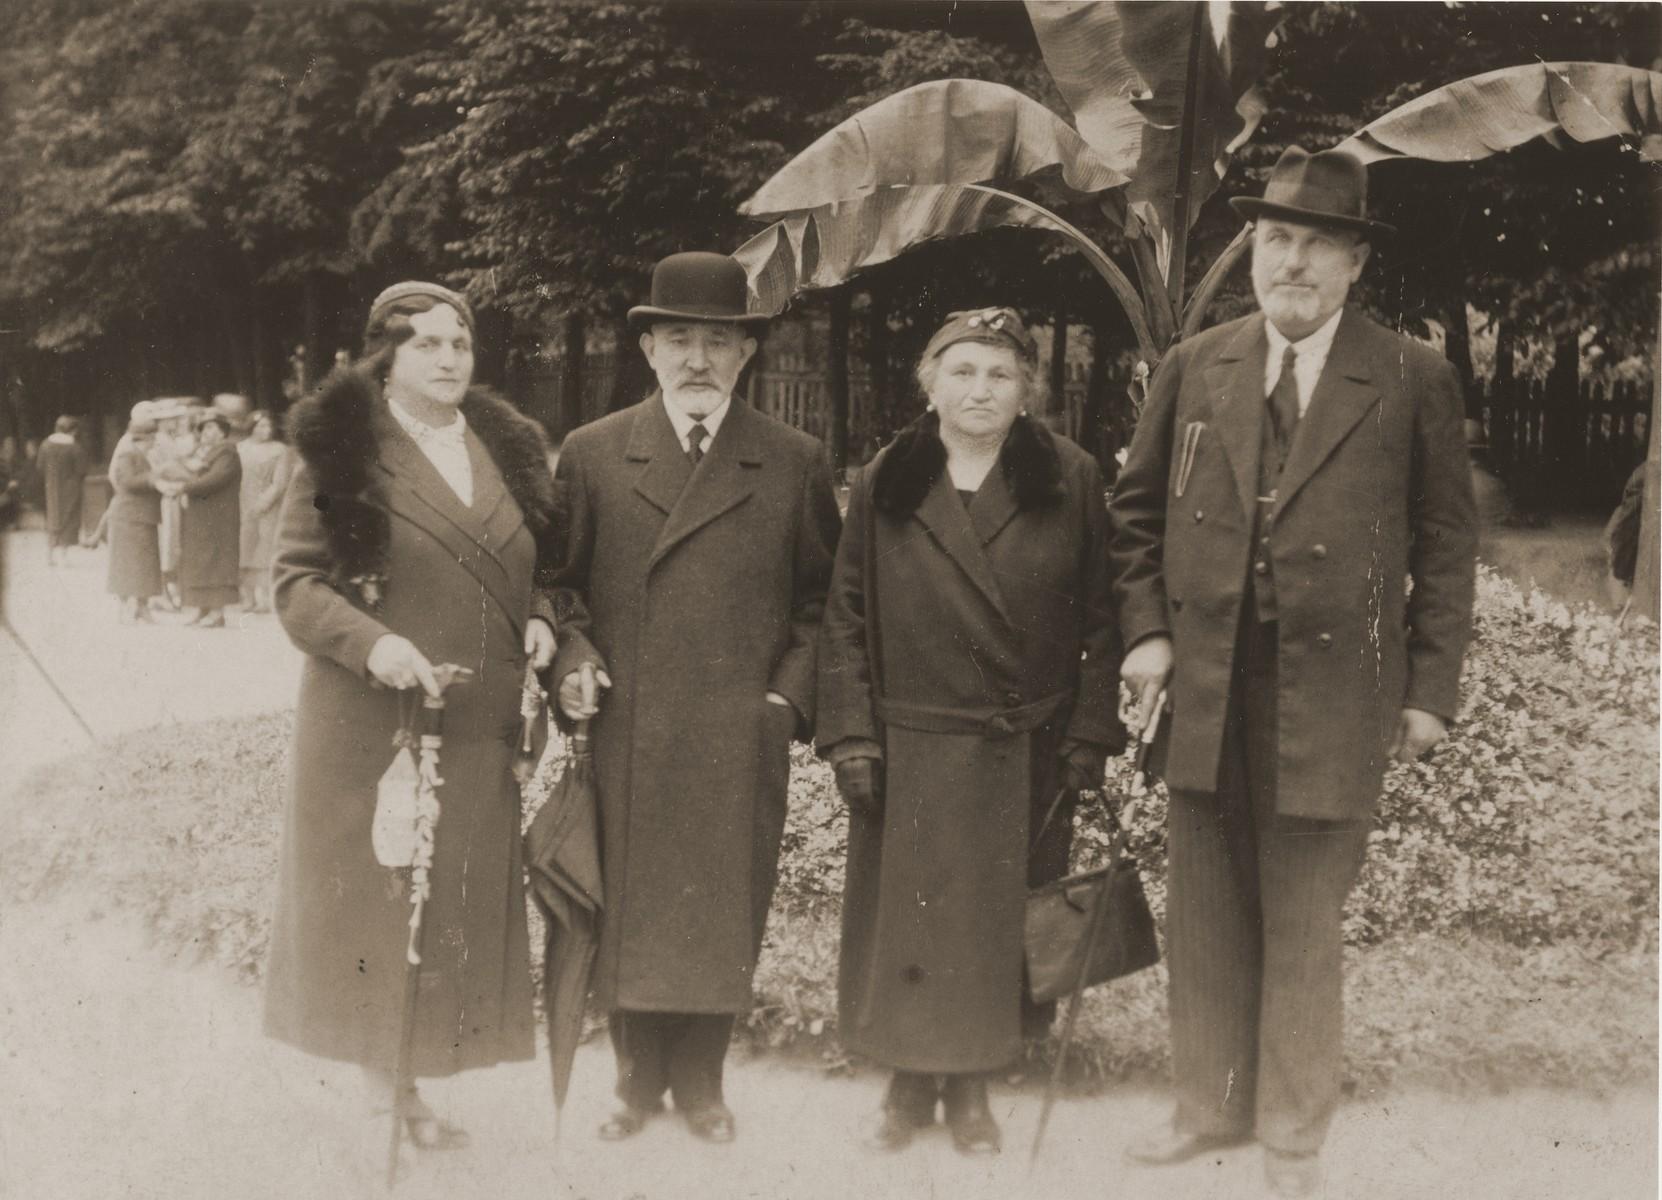 Members of the Frank family from Biala Rawska at a resort in Ciechocinek.